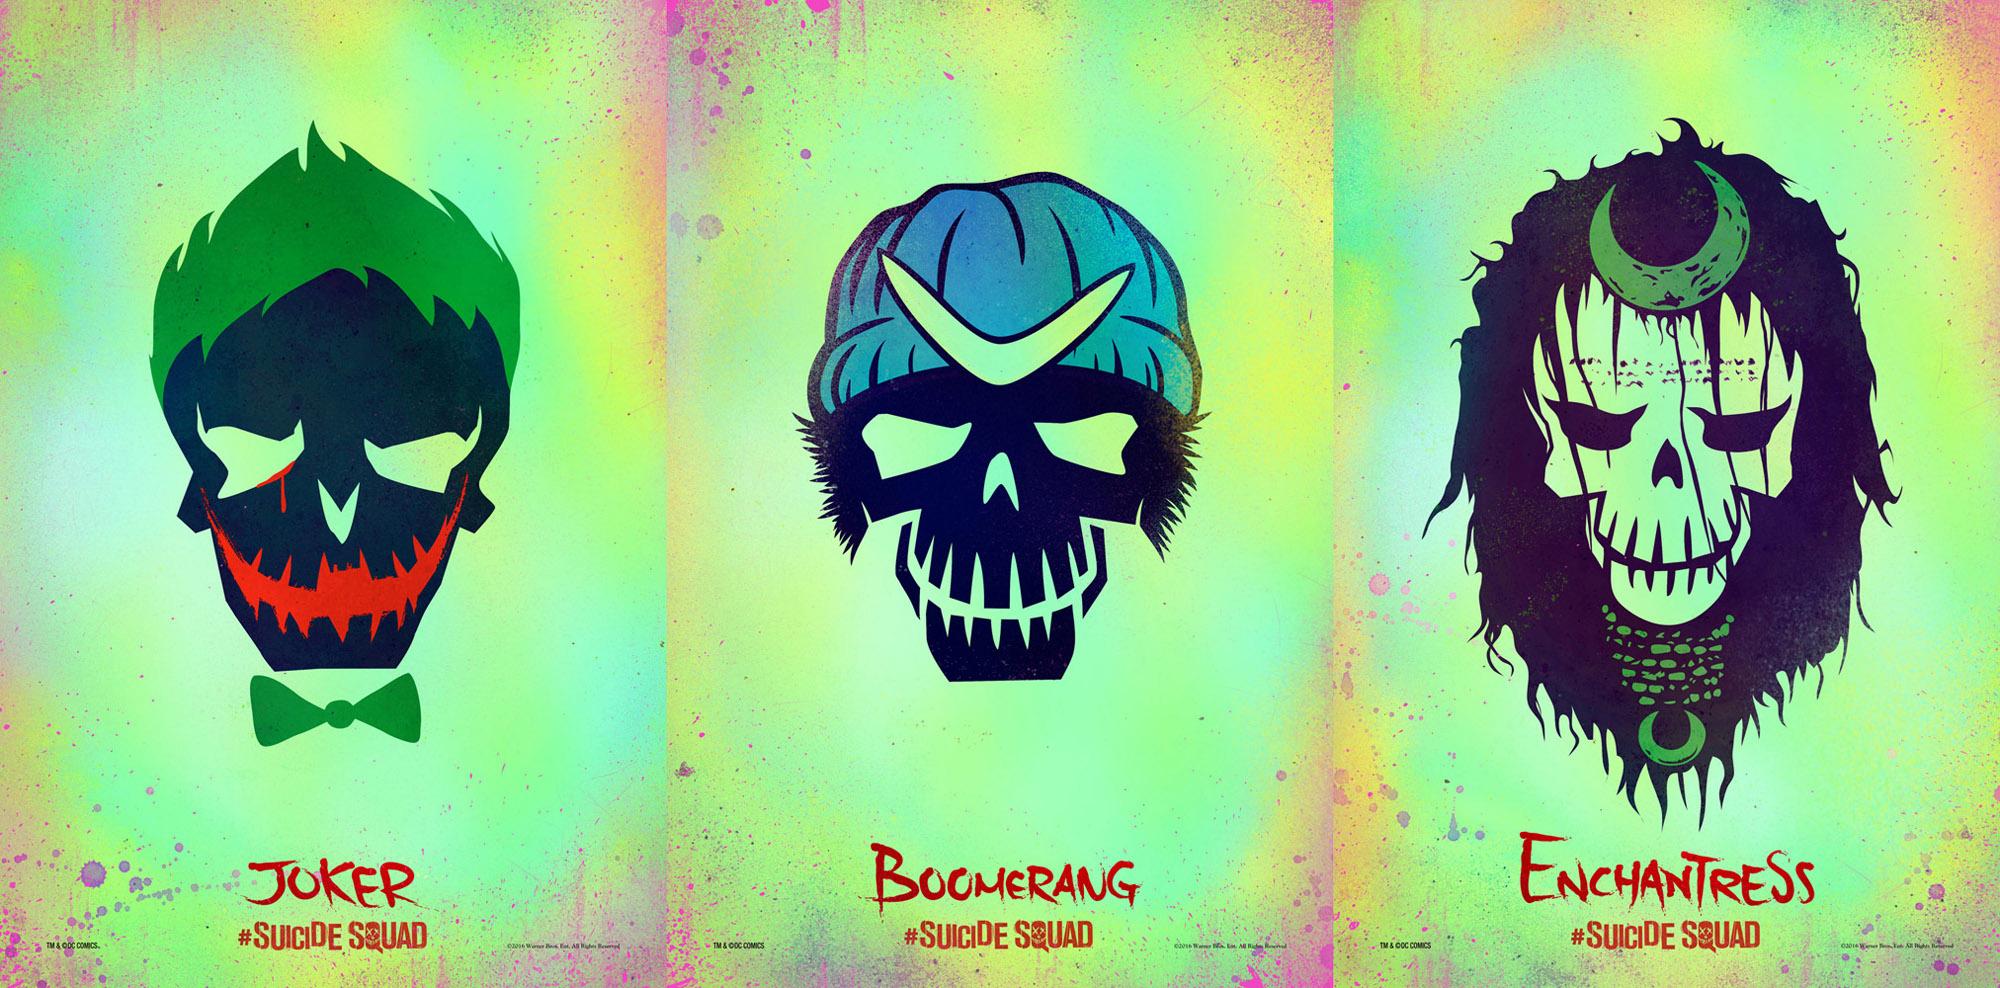 SUISQ_Joker_Boomerang_Enchantress